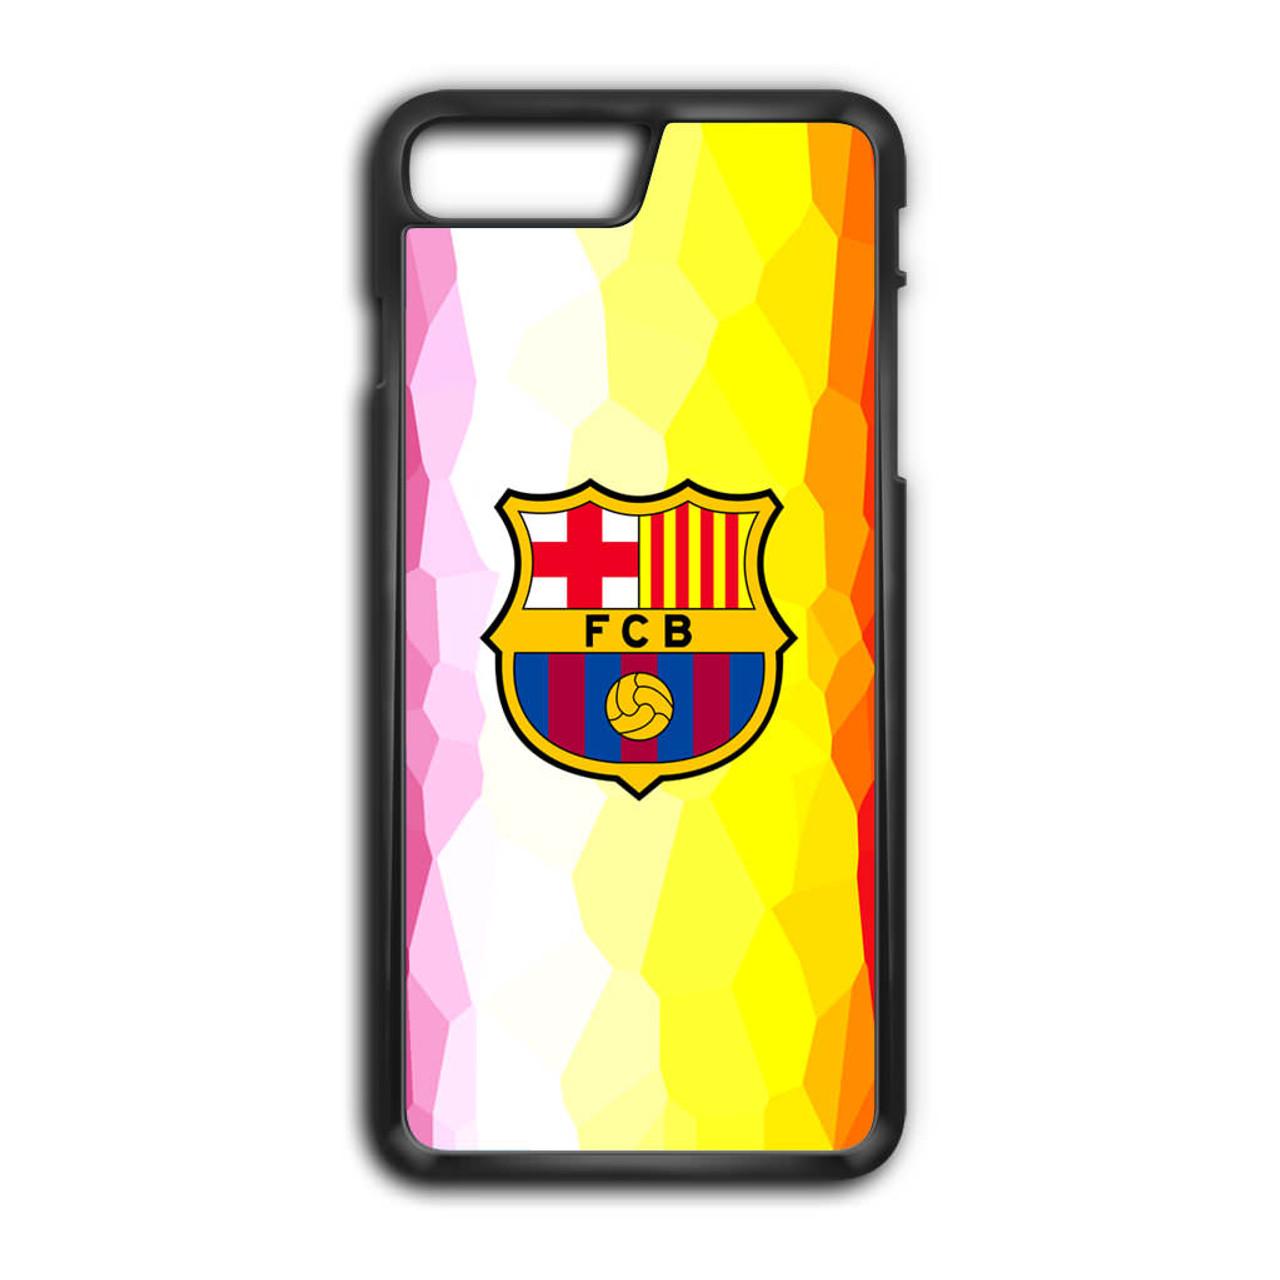 Fc Barcelona Mozaic Iphone 7 Plus Case Caseshunter